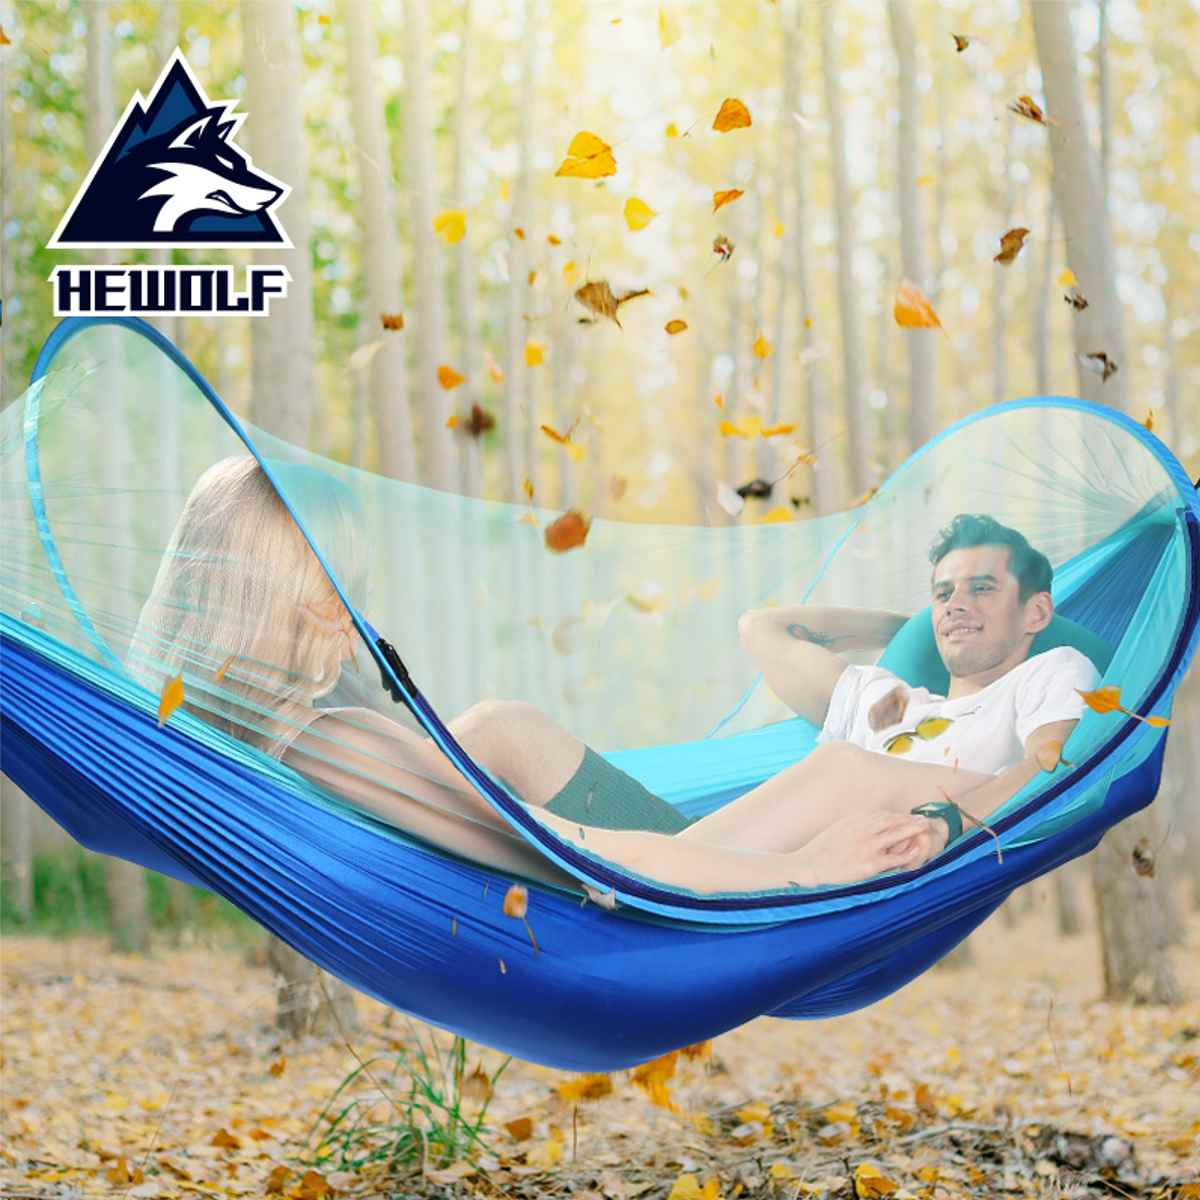 Portable Hammock Outdoor Hammock Garden Sports Home Travel Camping Swing Canvas Stripe Hang Bed Hammock 260x150cm 6 Color